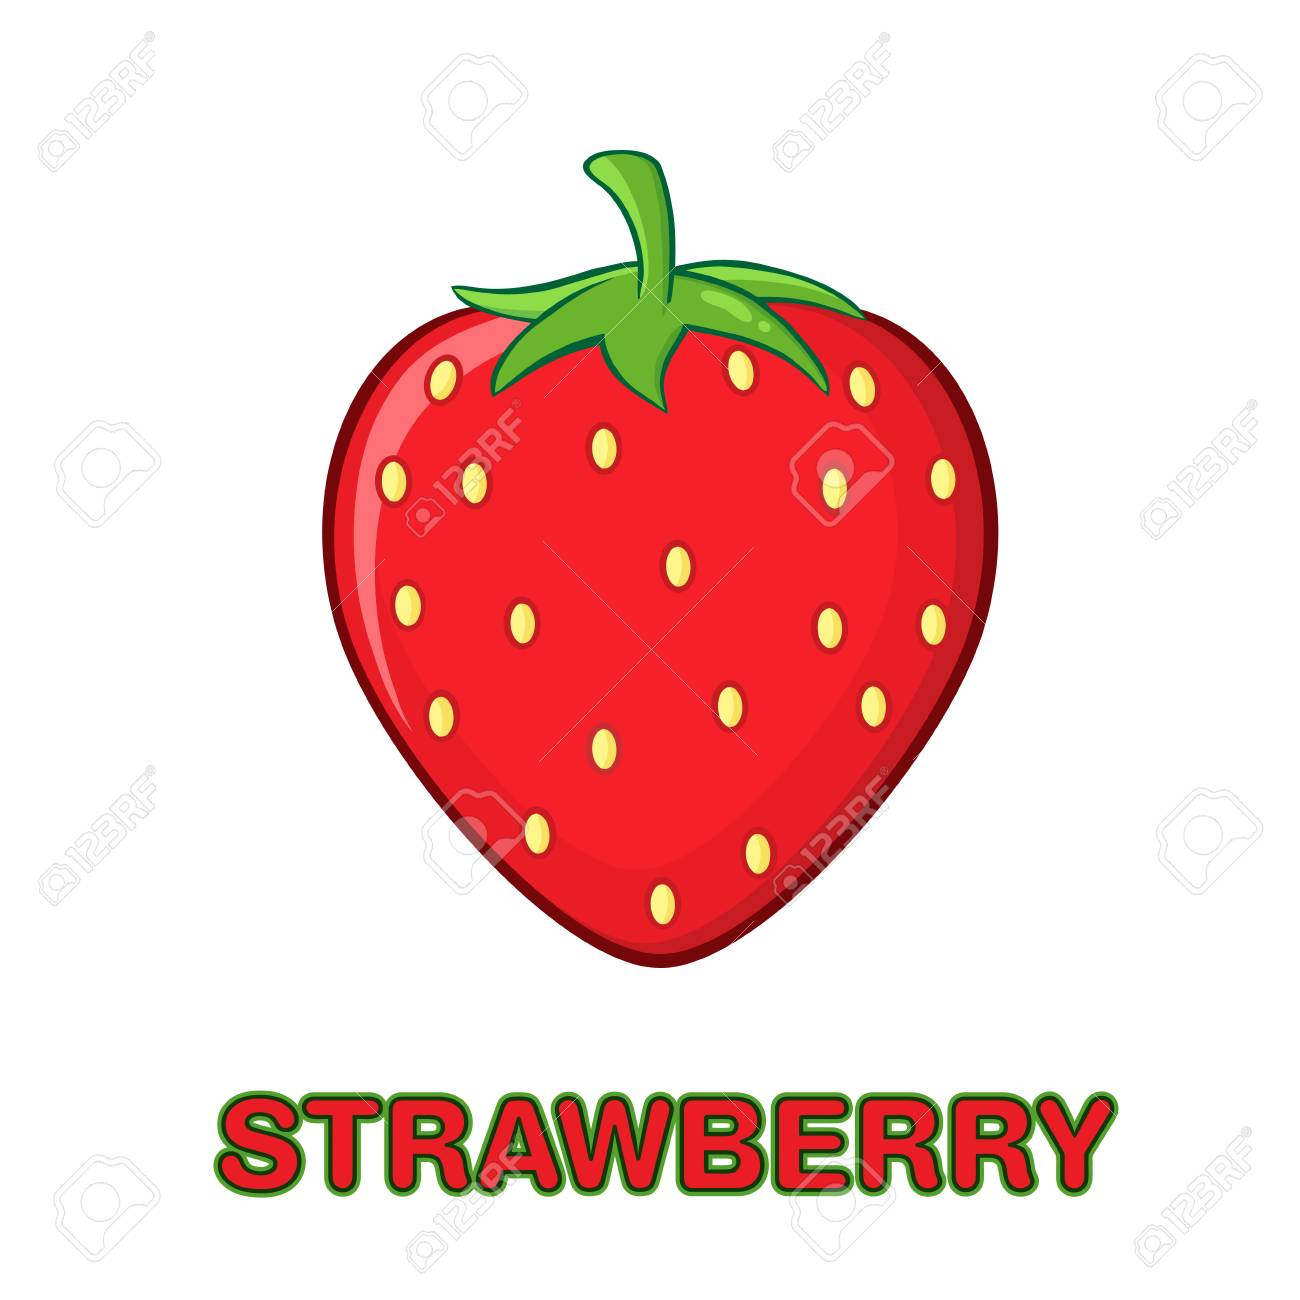 Dessin De Dessin Anime De Fraise Fruits Simple Design